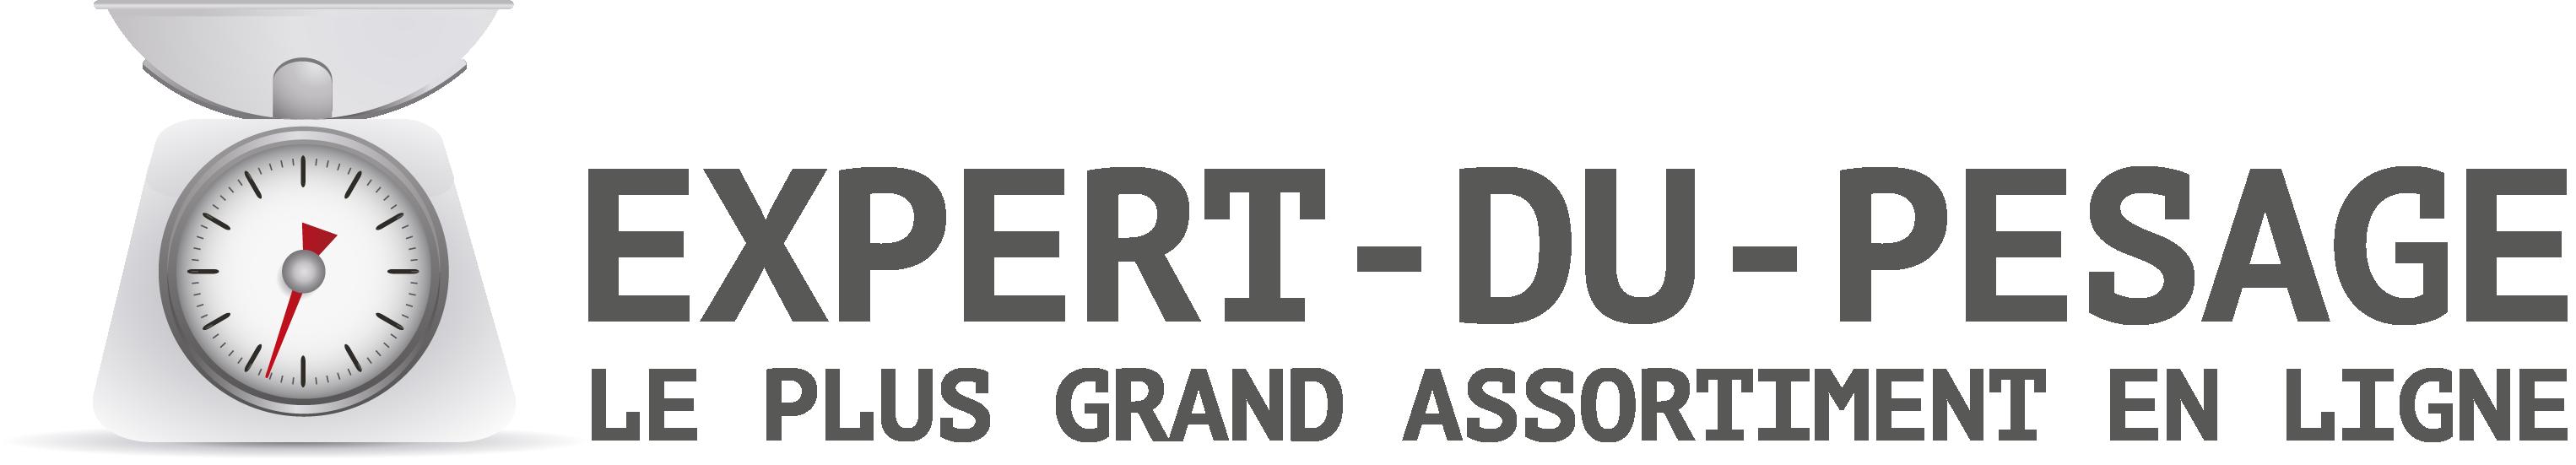 ExpertDuPesage.fr